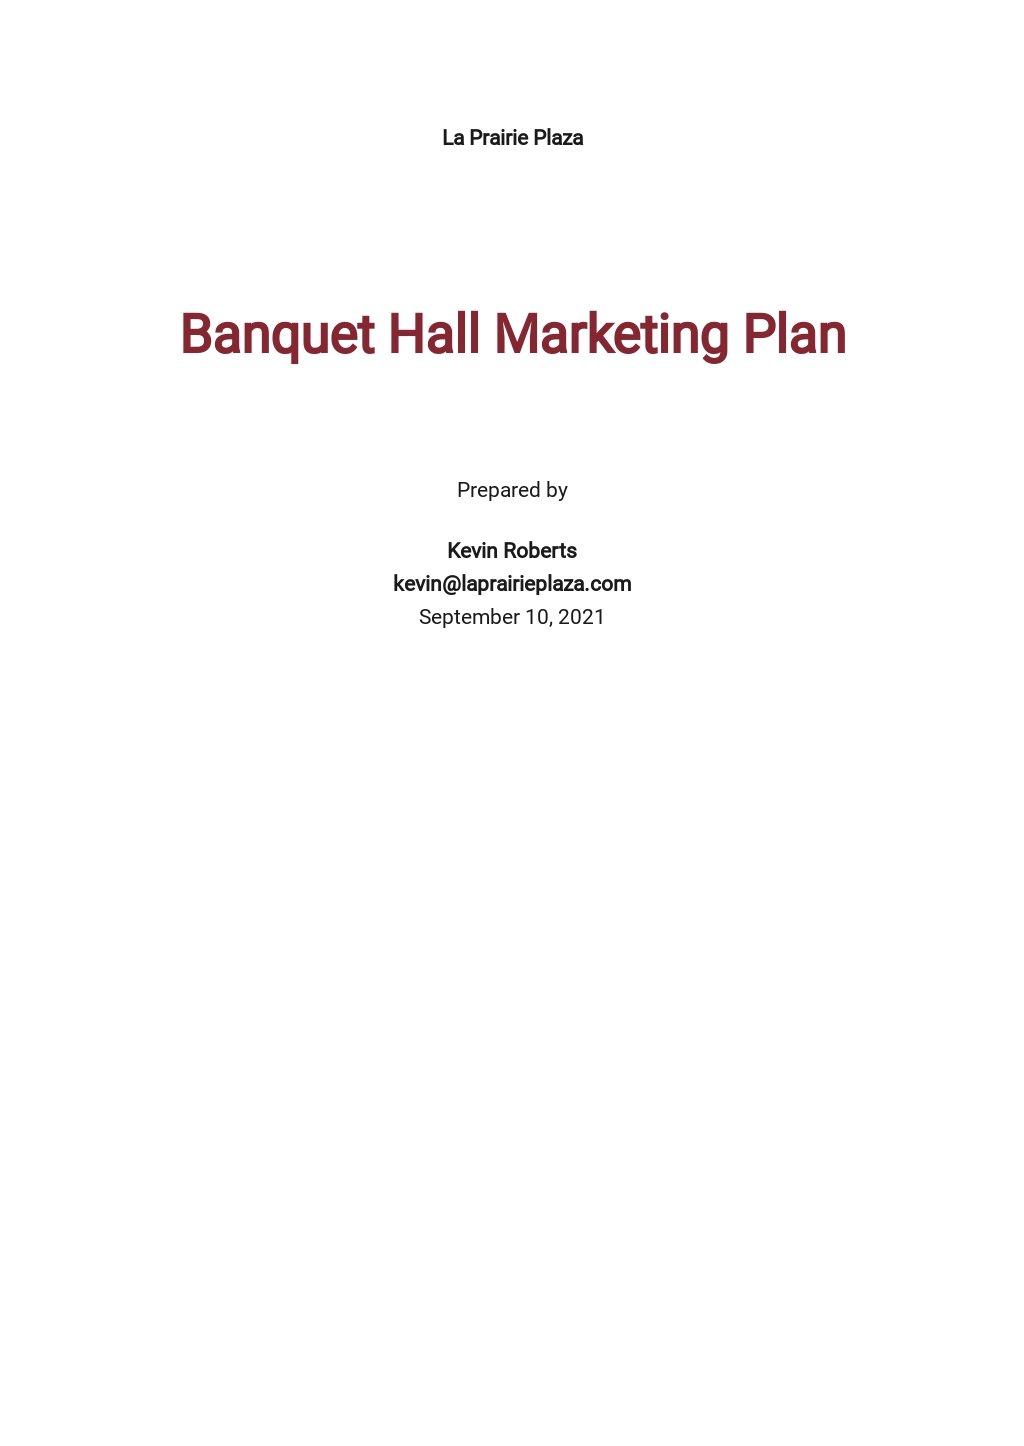 Banquet Hall Marketing Plan Template.jpe